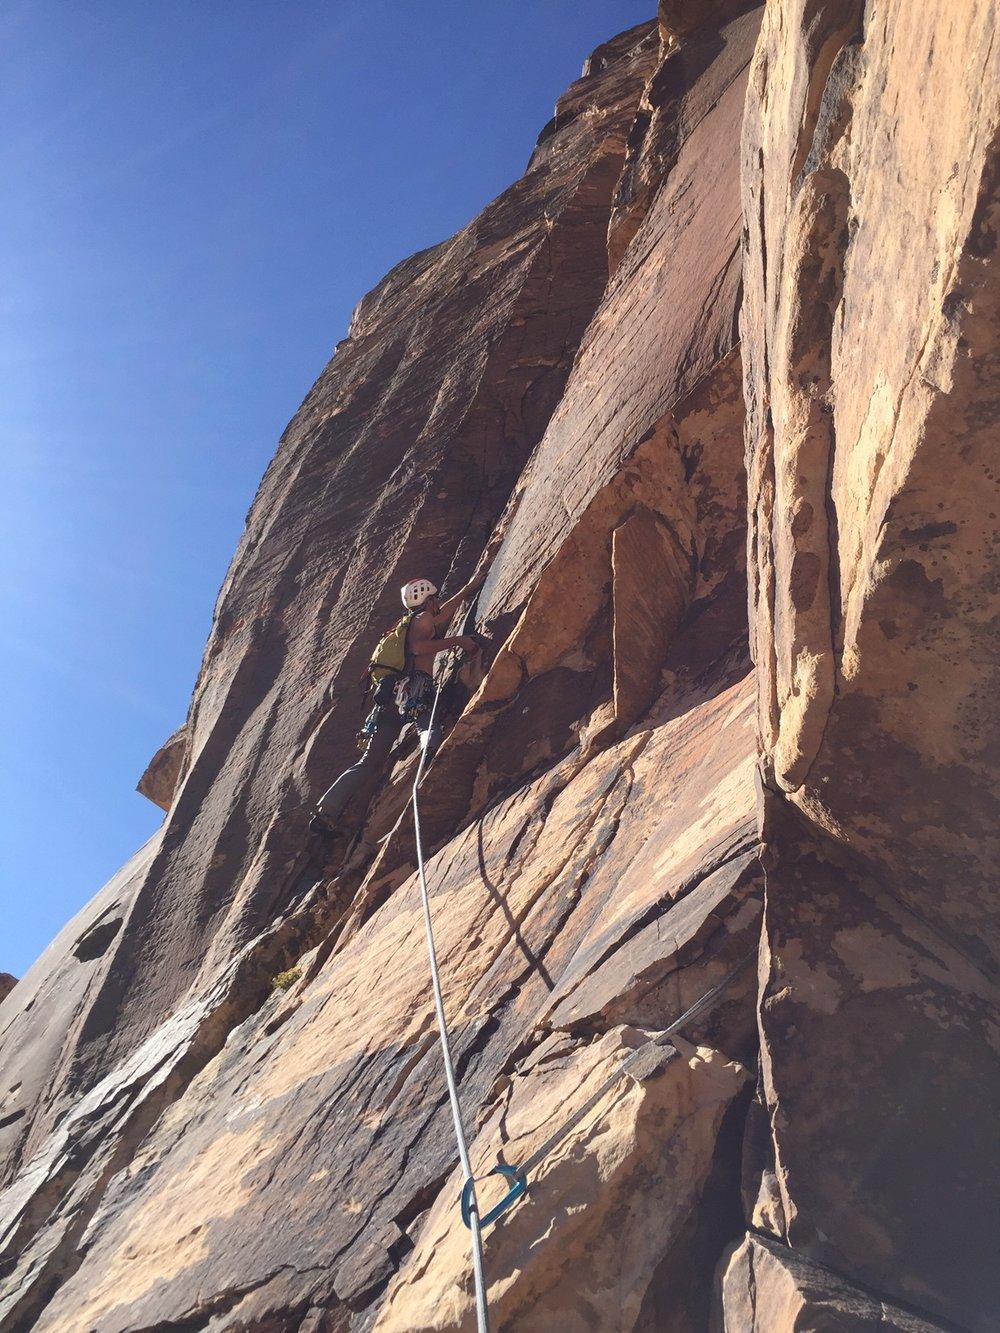 Red Rock Nevada 6 Alpine Climber Rock Climbing SAANO Adventures Trad Climbing Multi Pitch.JPG